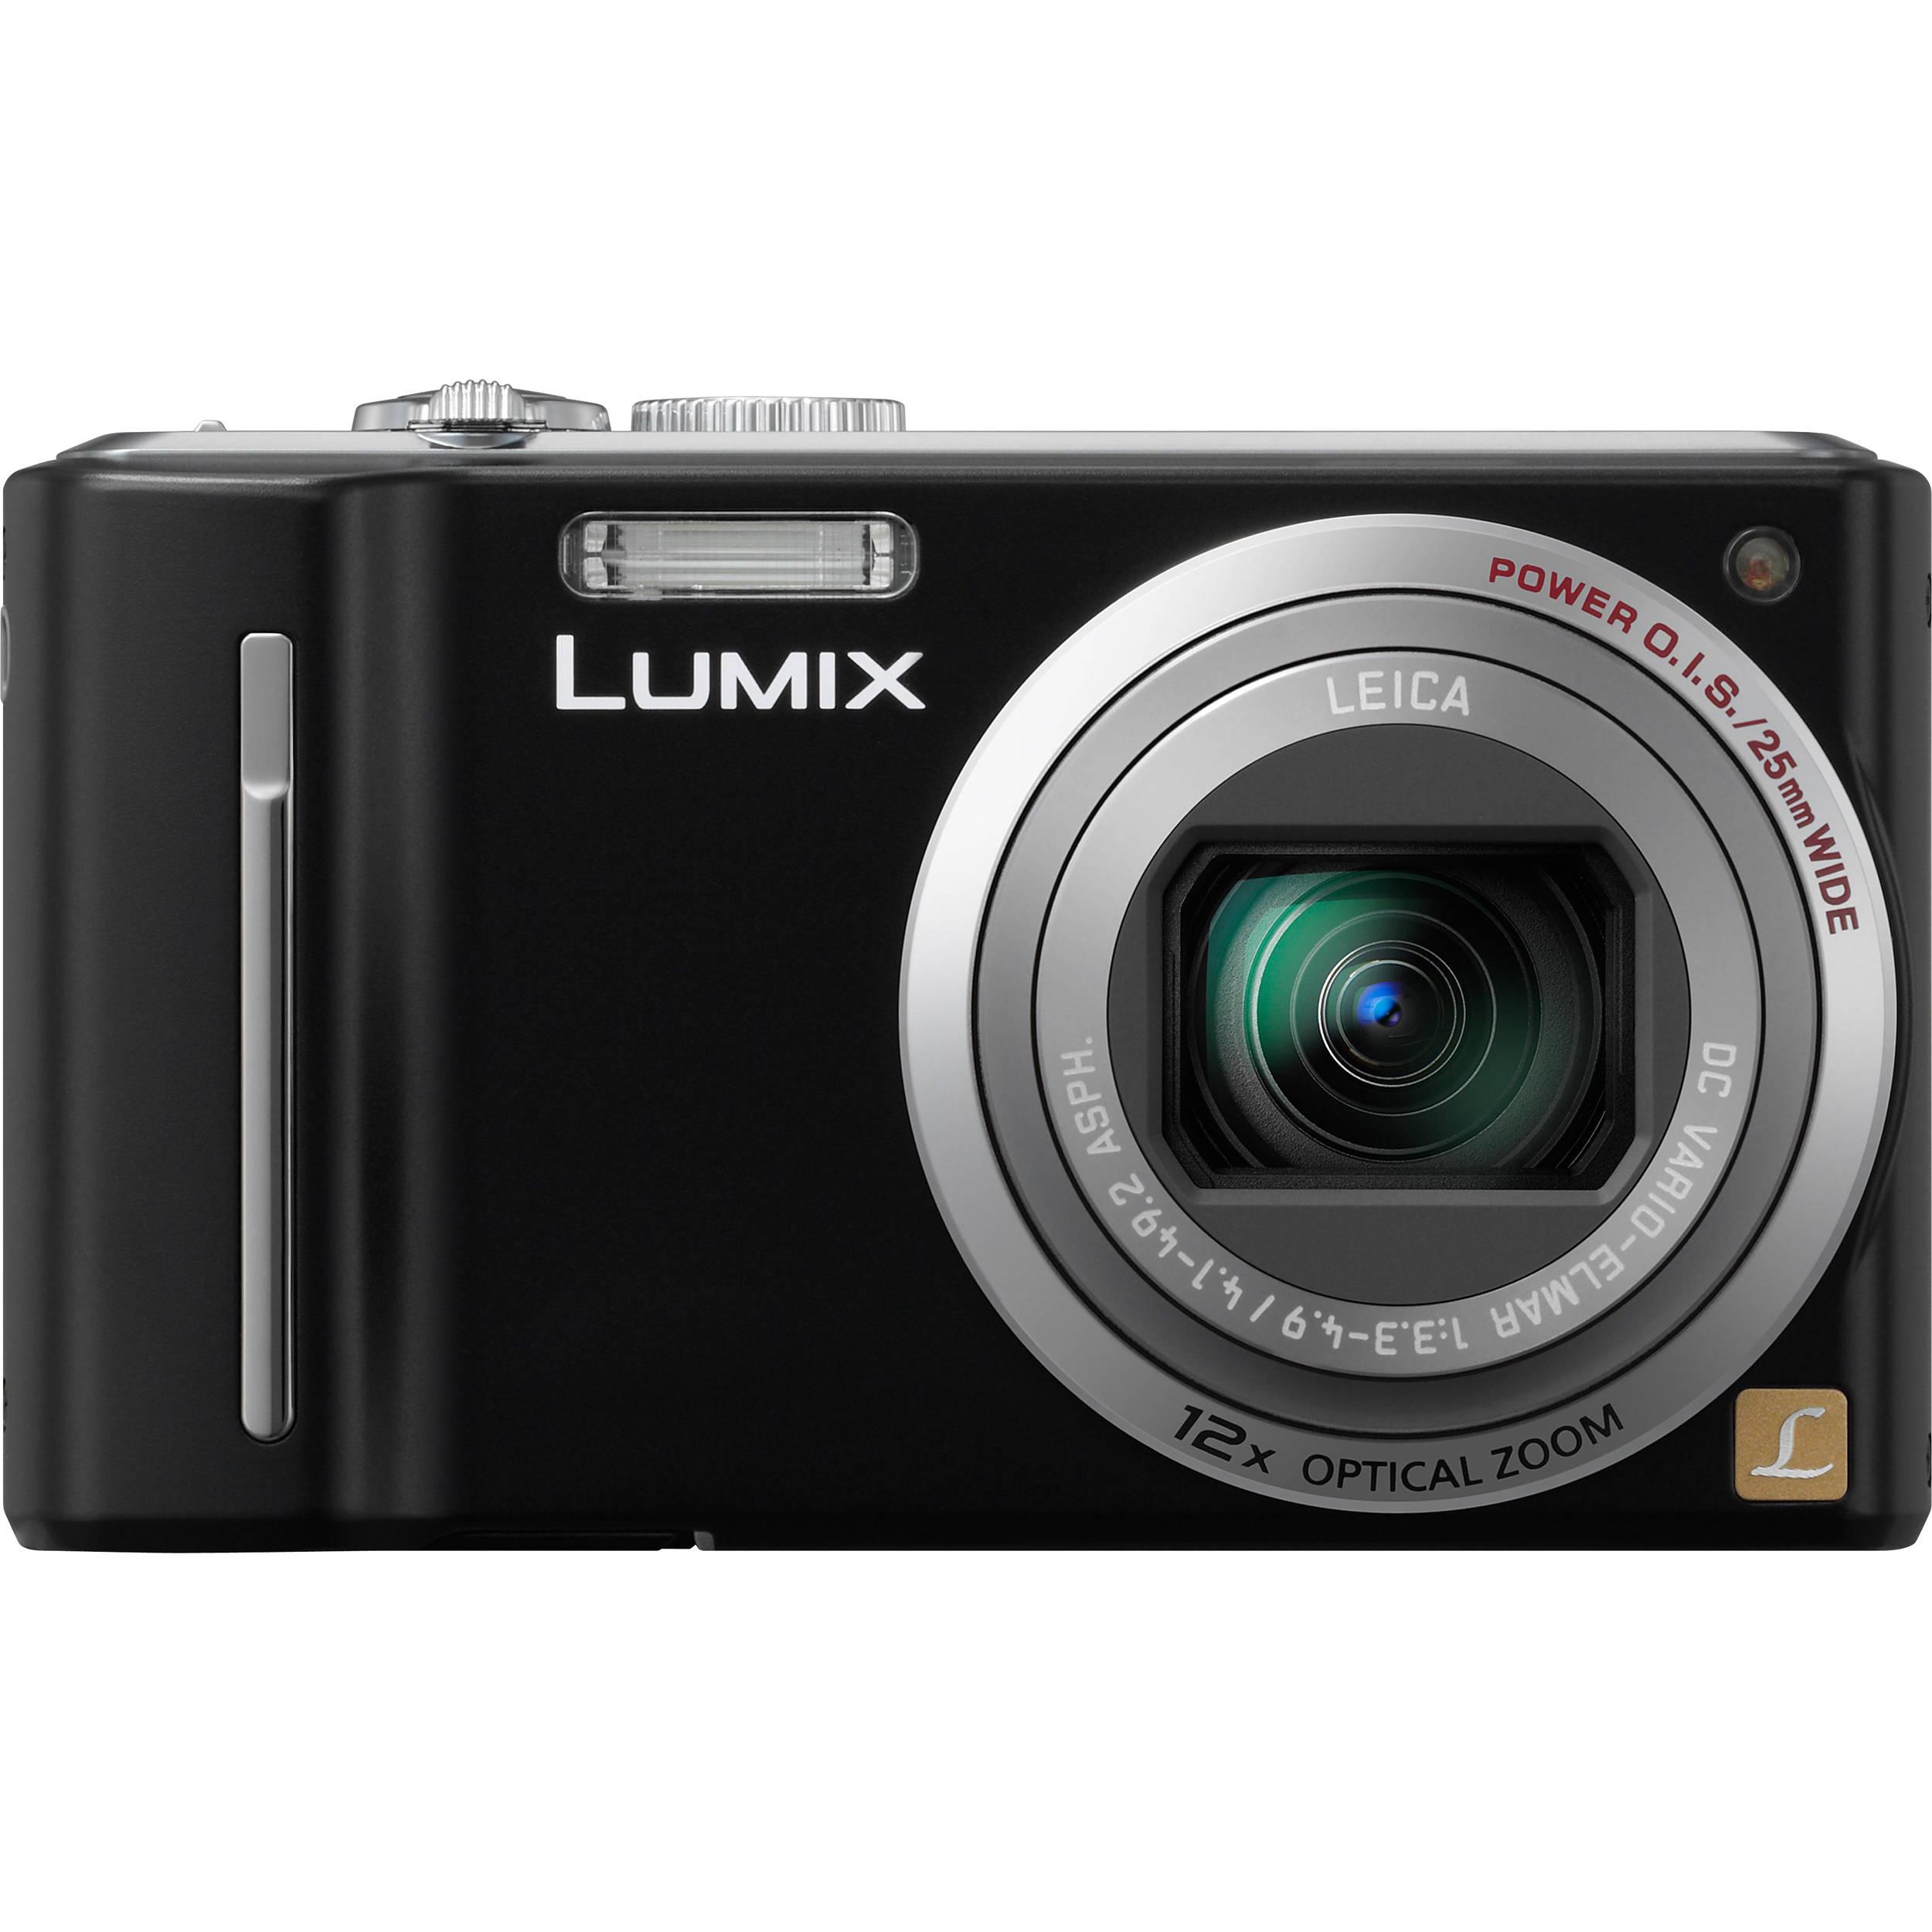 panasonic lumix dmc zs5 digital camera black dmc zs5k b h rh bhphotovideo com Panasonic Lumix DMC FZ30 Software panasonic lumix dmc-tz9 user manual